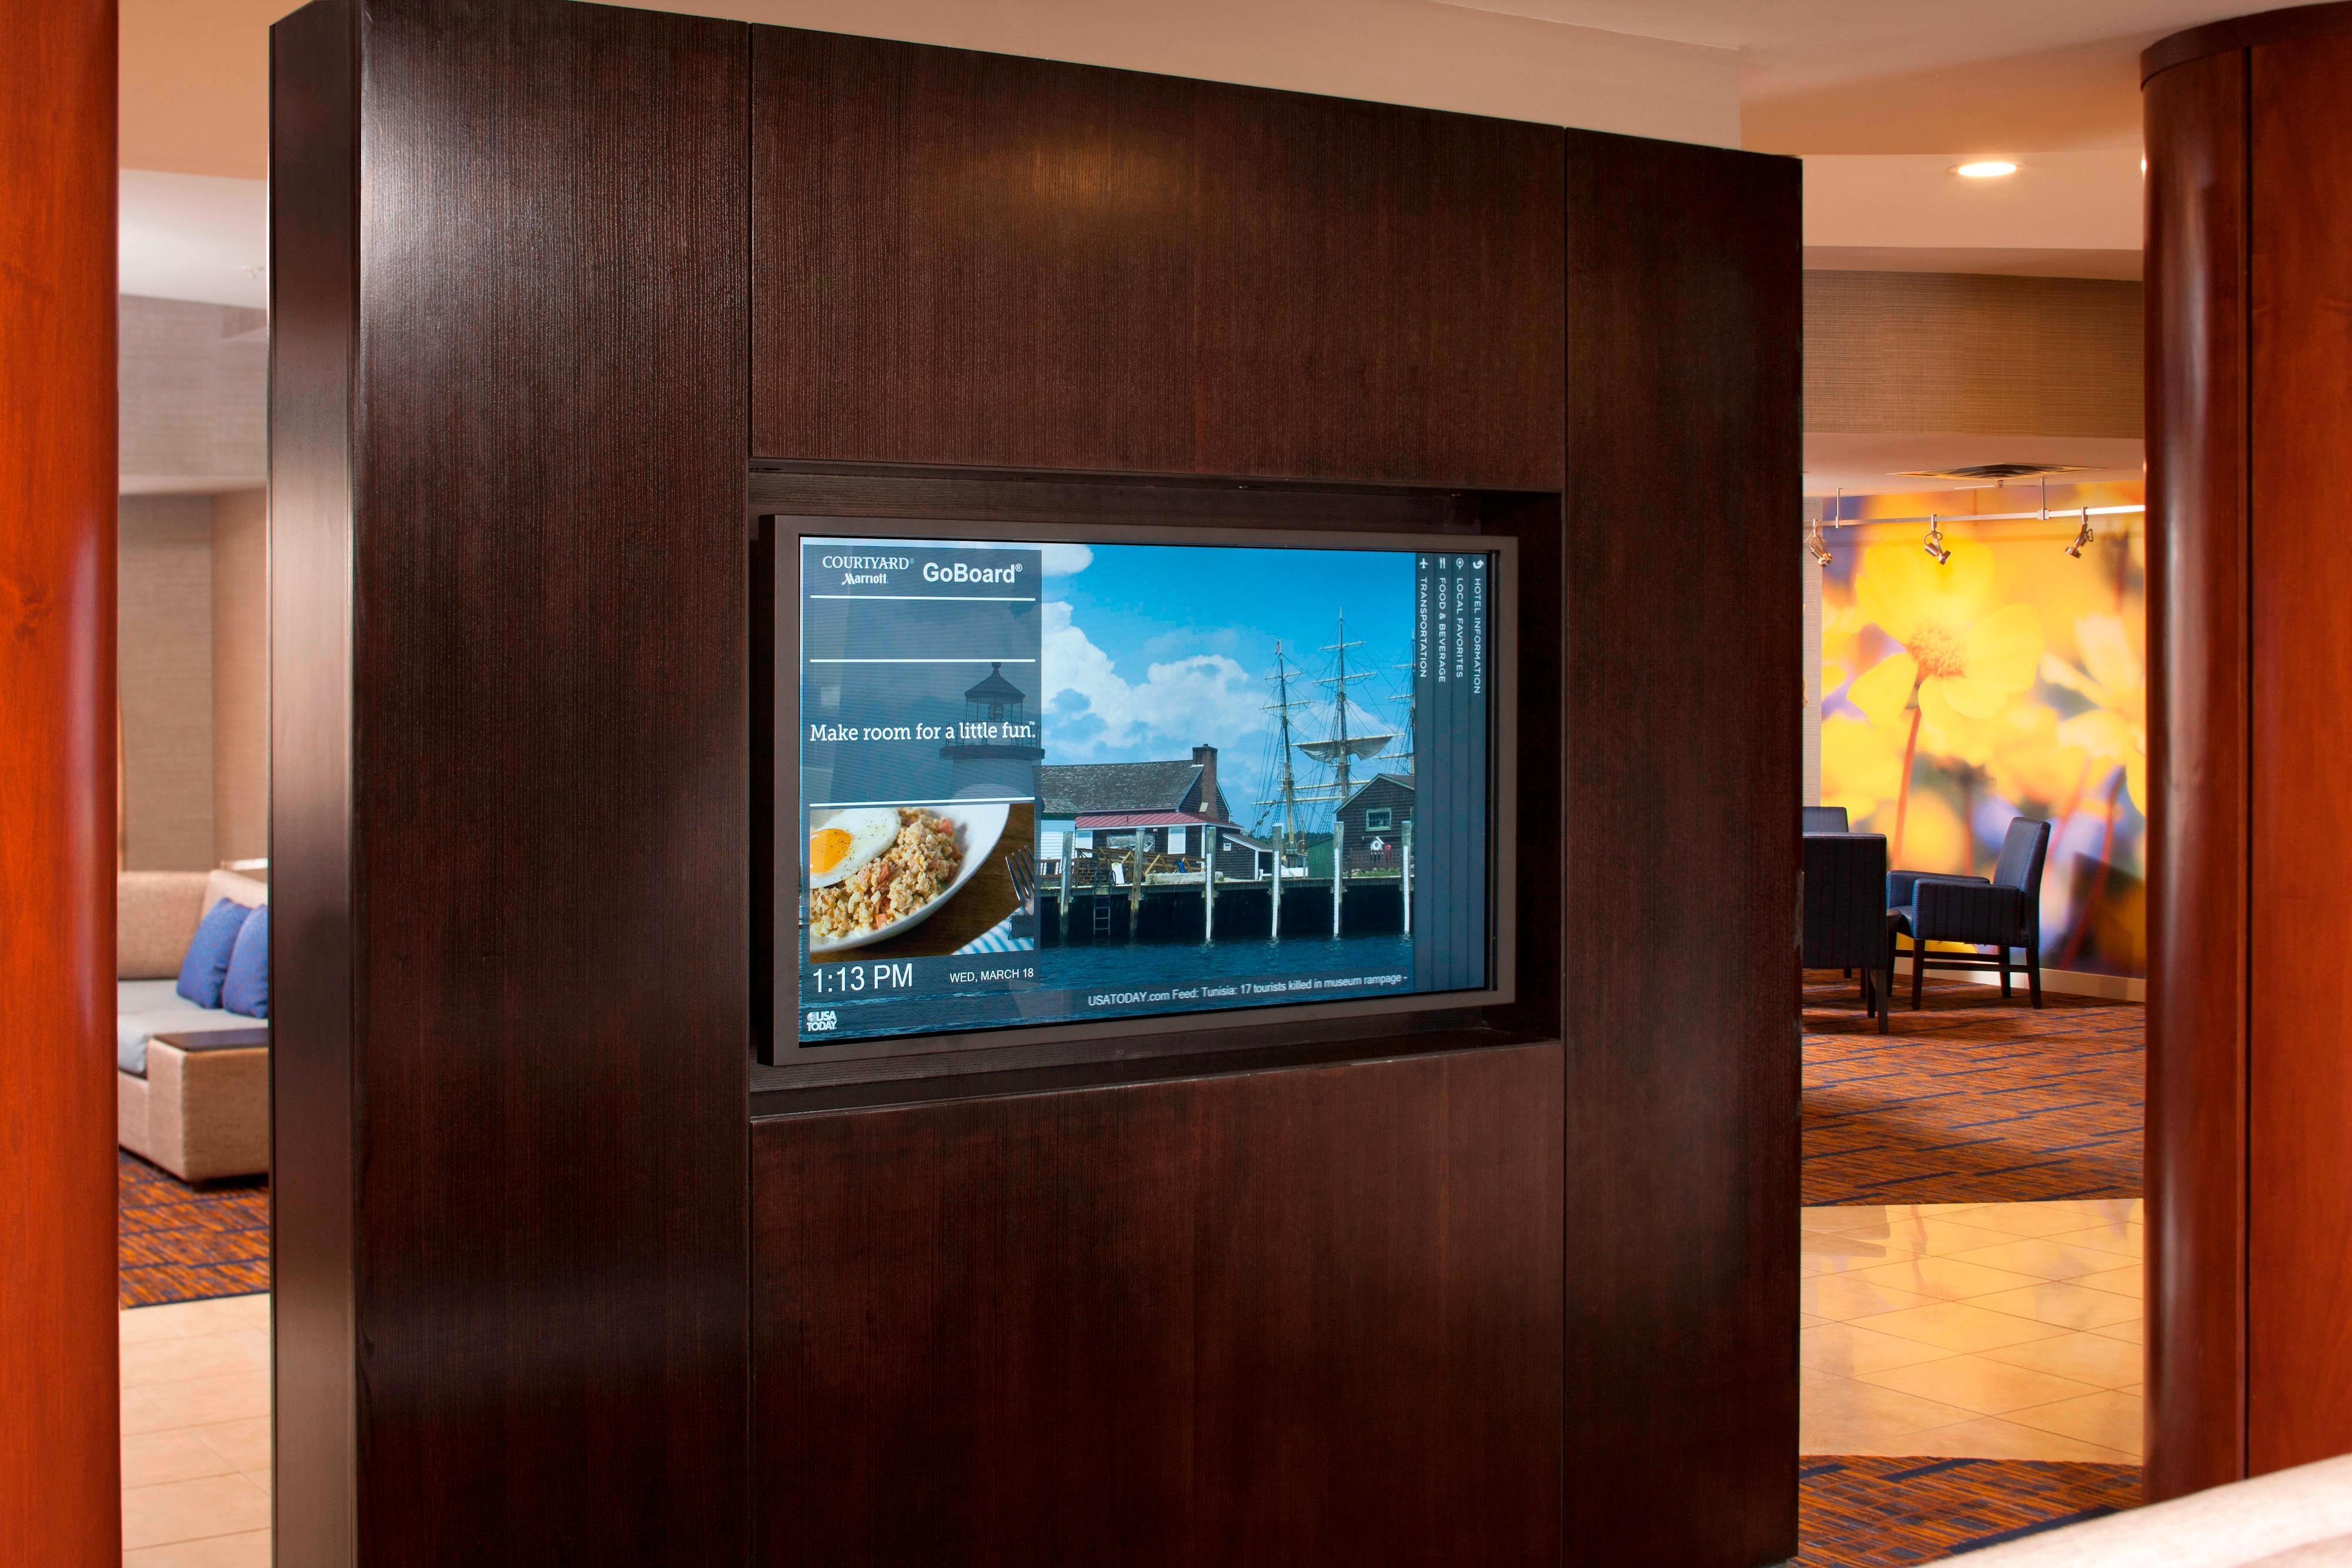 Farmington Hotel GoBoard